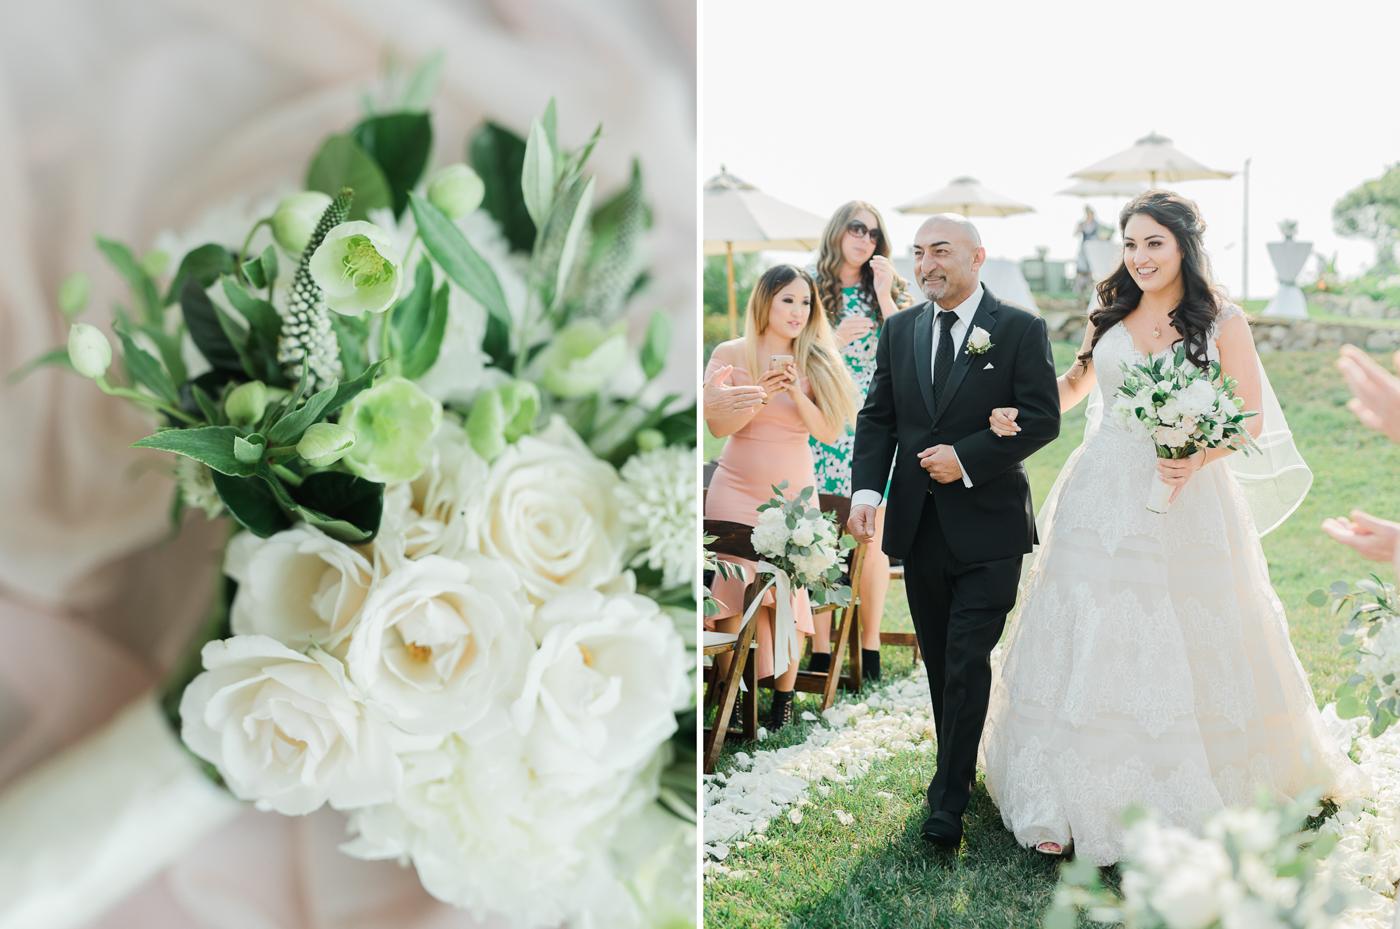 AKP_S&F_Malibu_Wedding_Fine_Art_Photography_Los_Angeles-15_ceremony.jpg